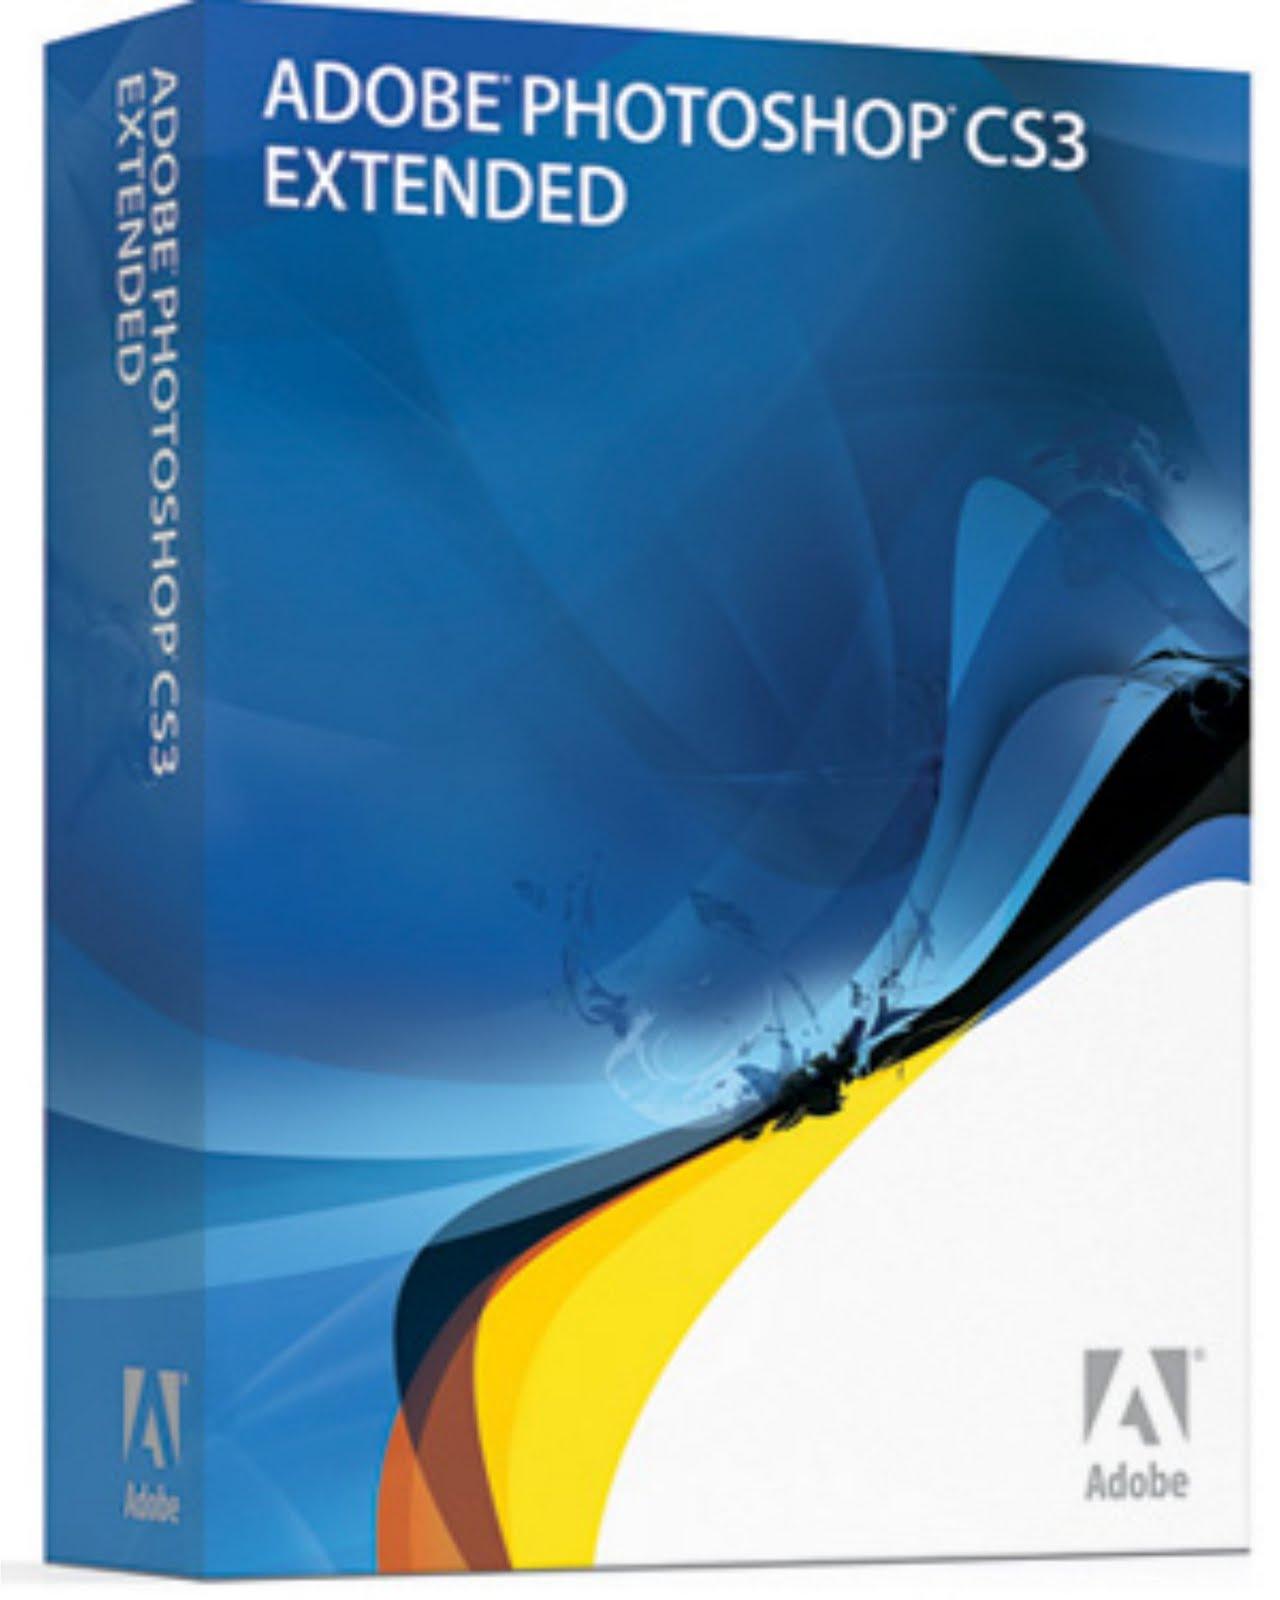 Adobe photoshop cs activation crack paradox : acunla